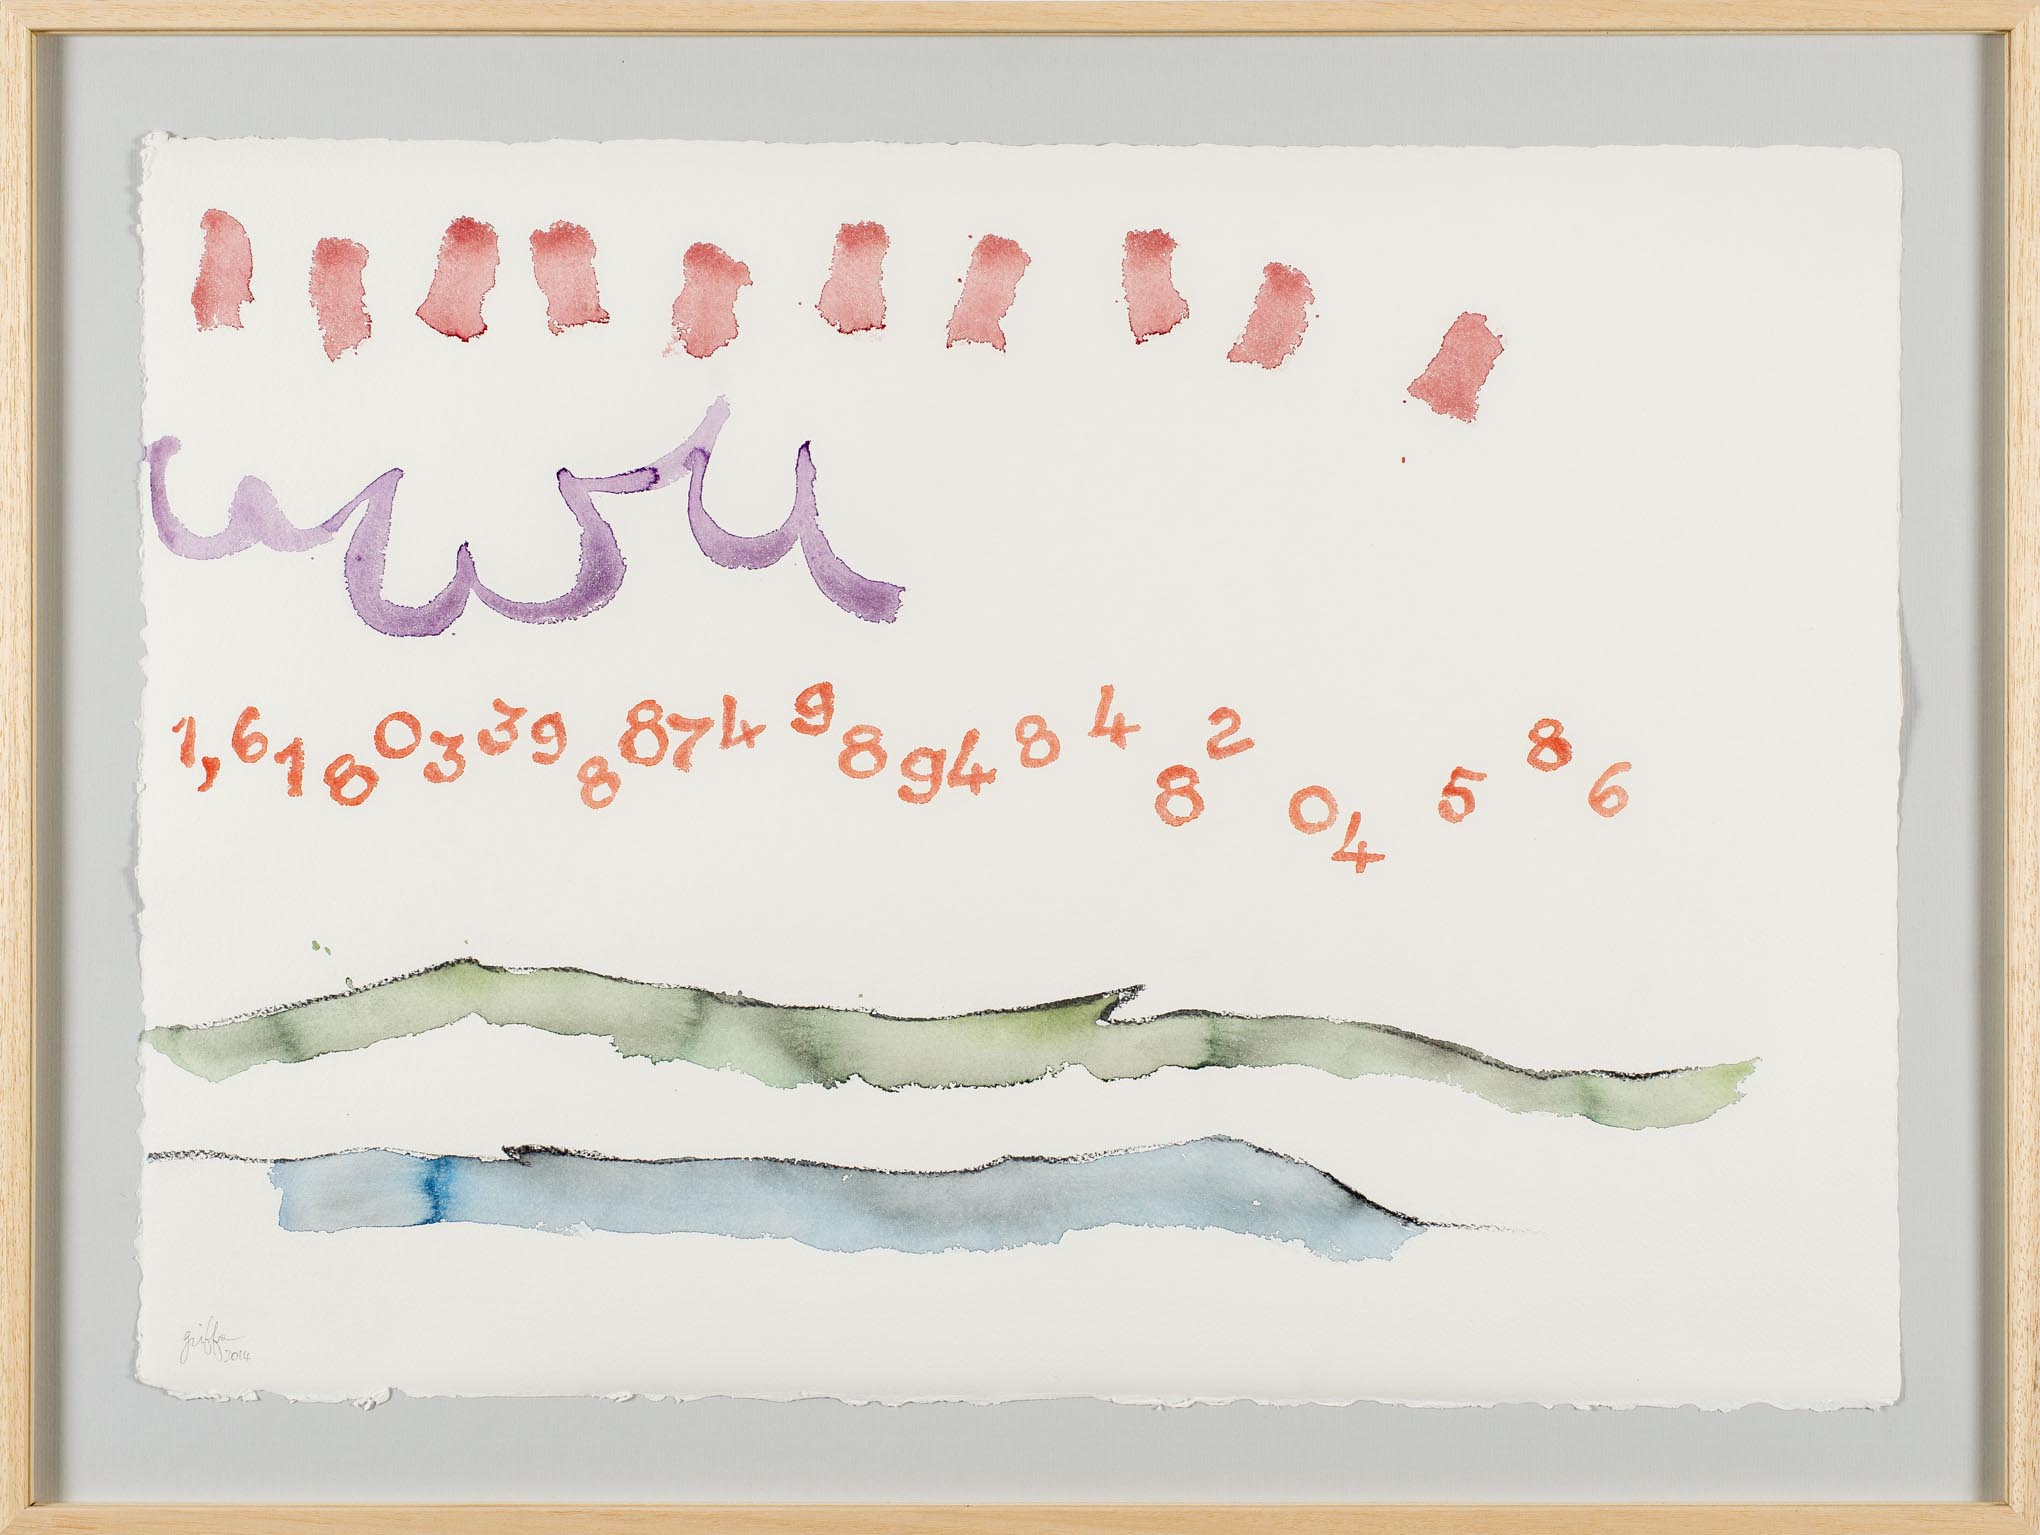 Giorgio Griffa Canone aureo 586, 2014; Courtesy the artist and Casey Kaplan Gallery, New York